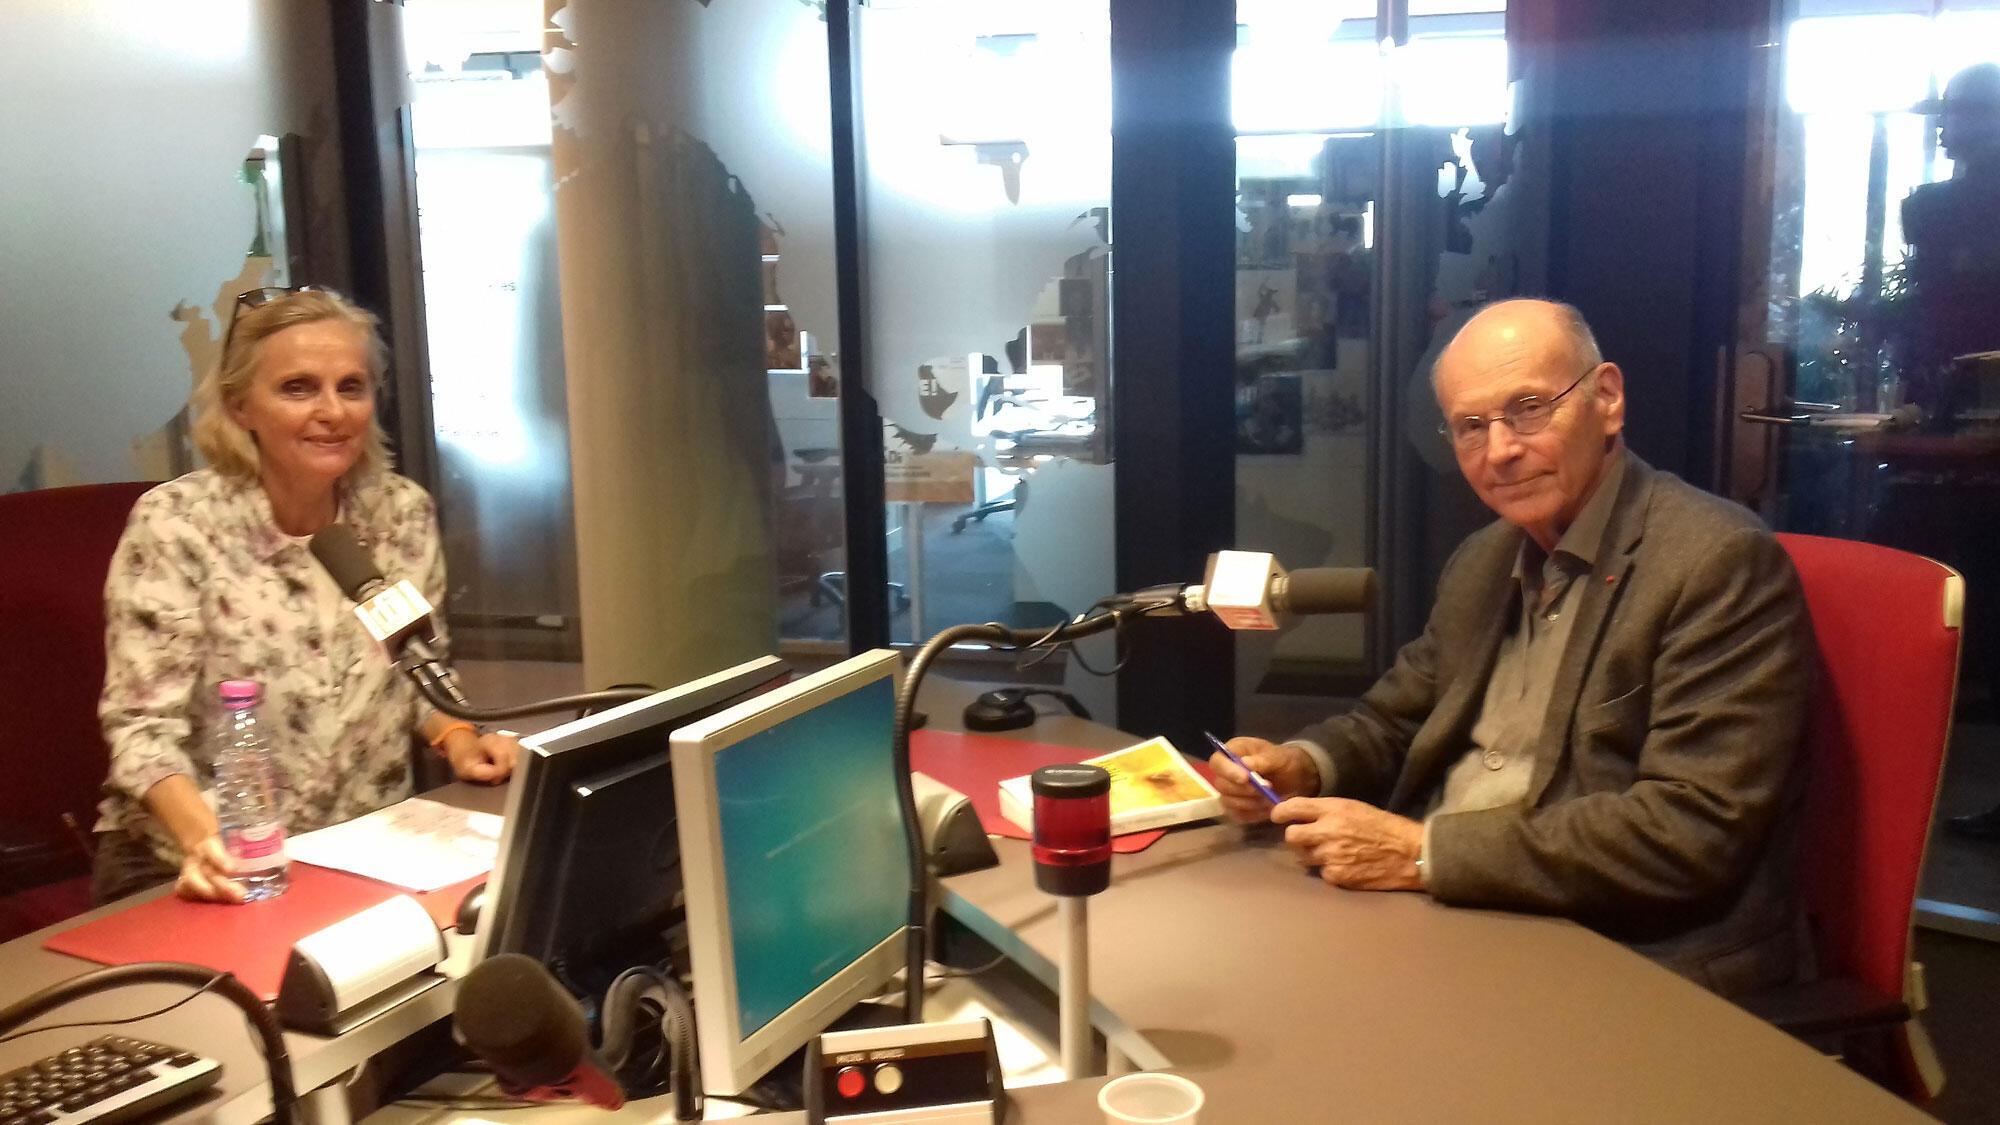 Geneviève Delrue et Boris Cyrulnik en studio à RFI.